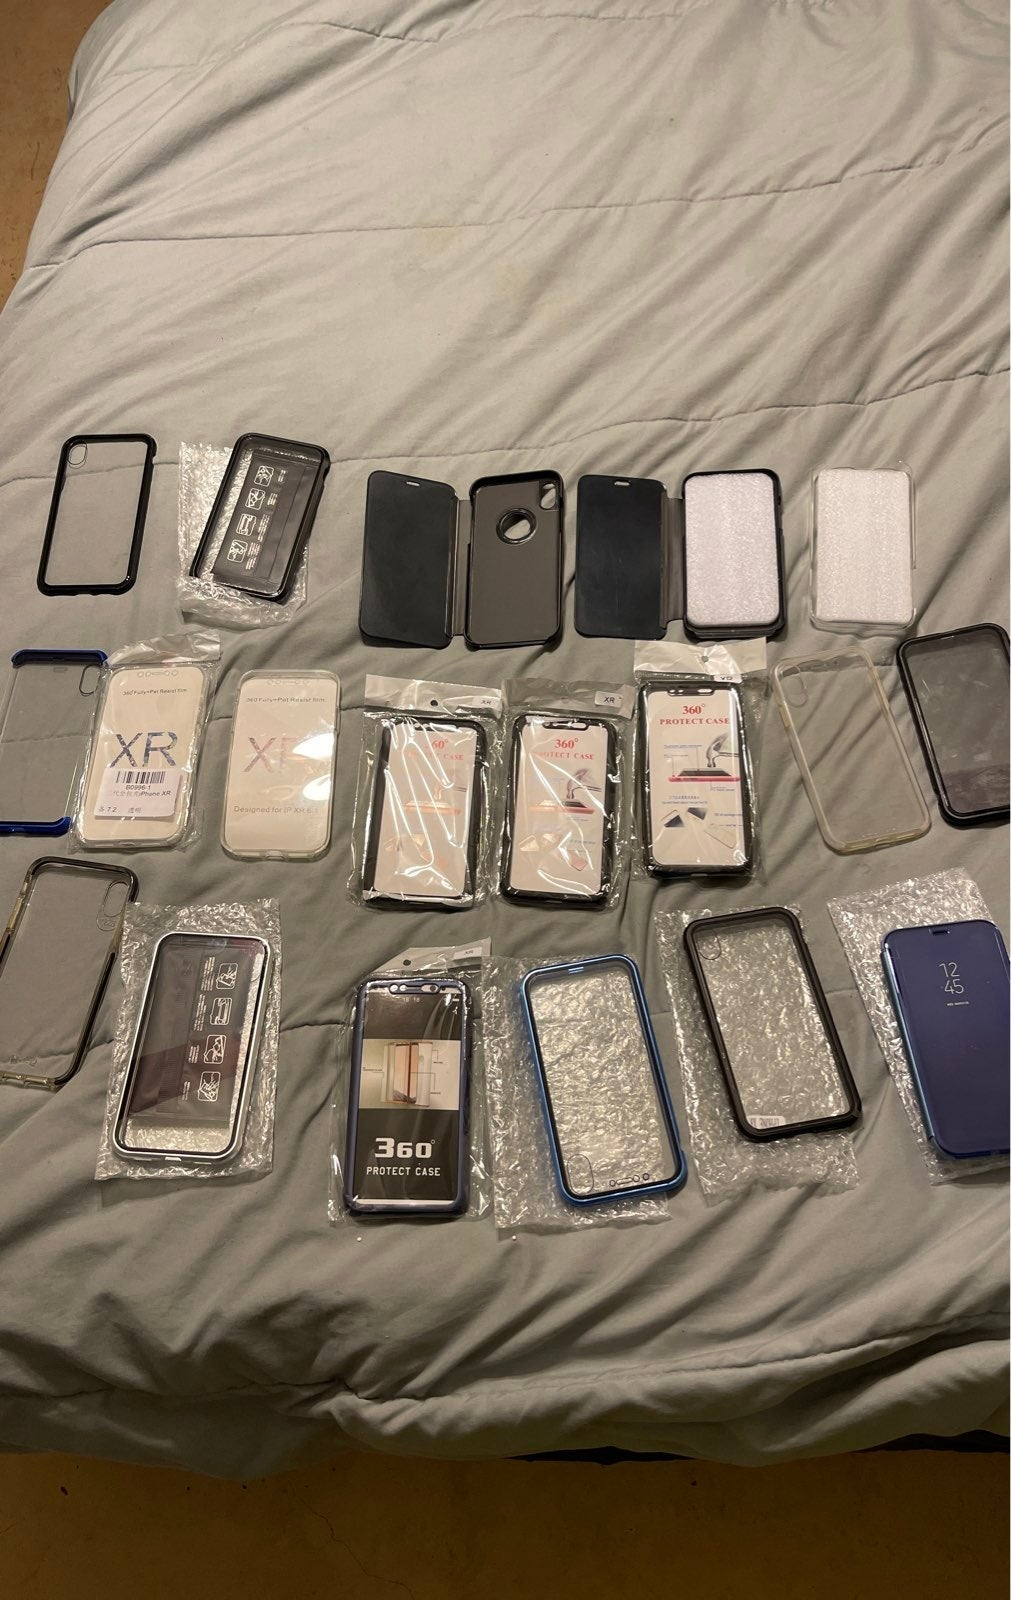 iPhone XR phone cases